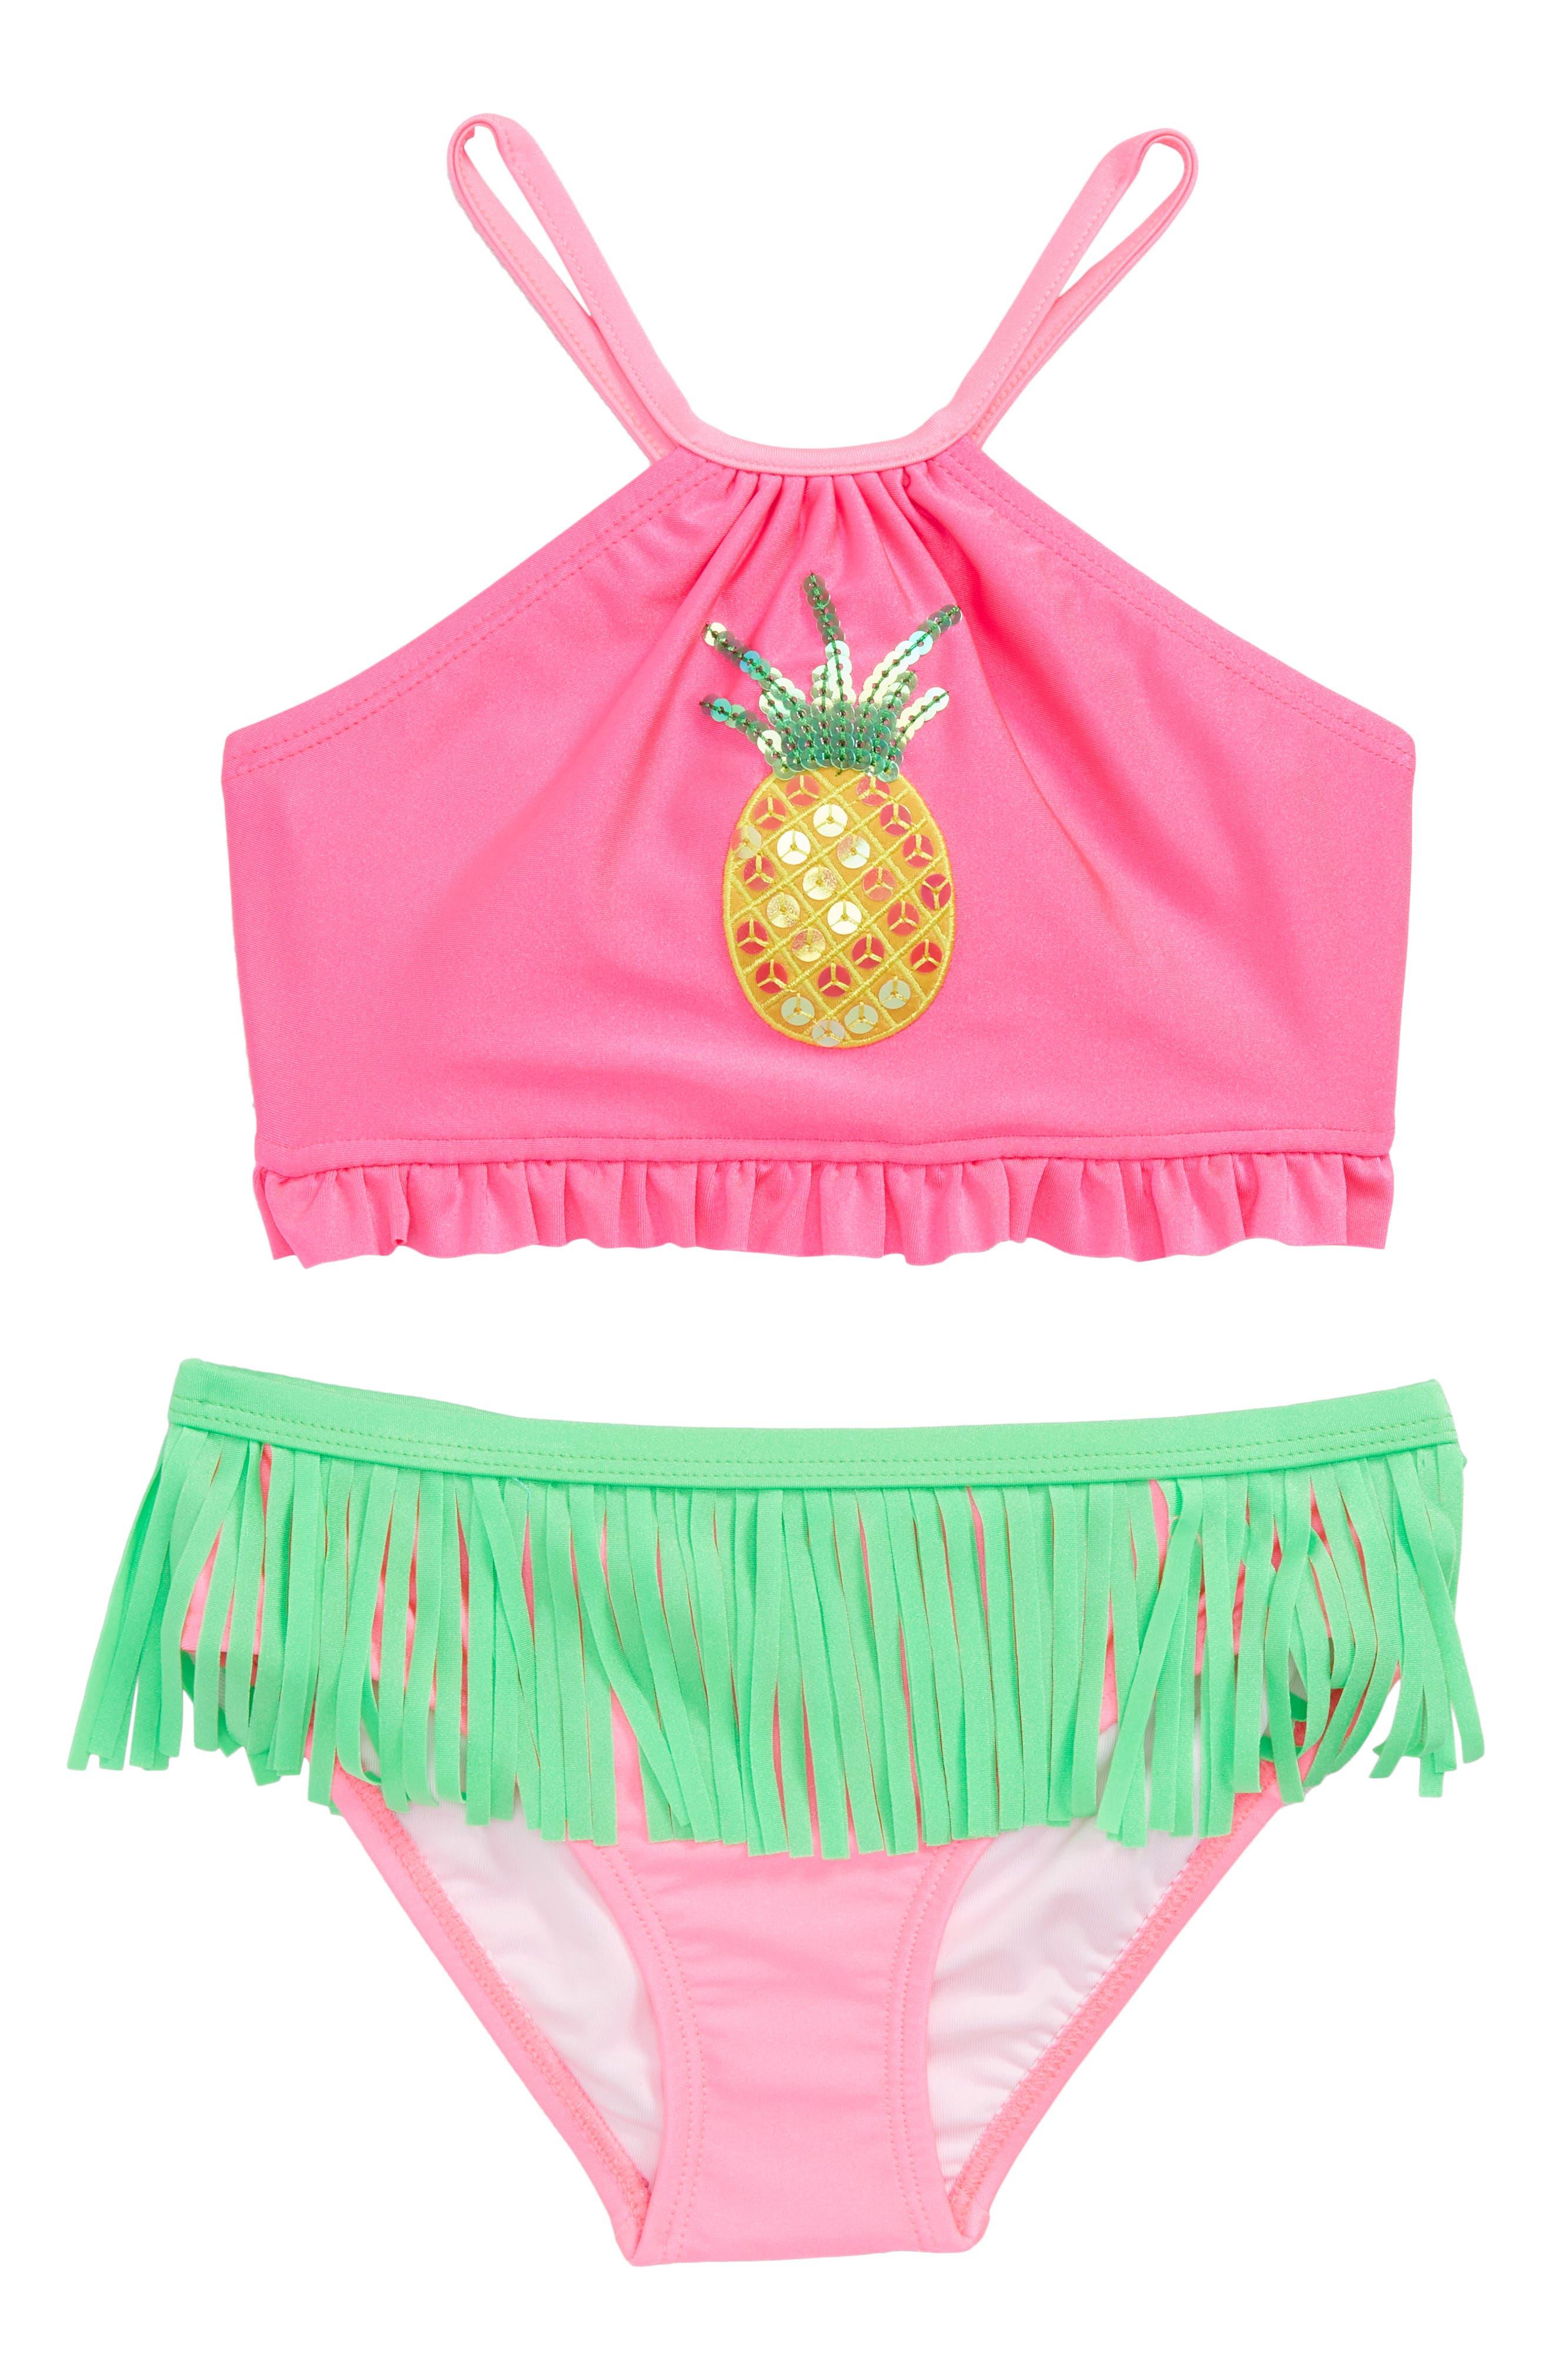 Pineapple Hula Two-Piece Bikini Swimsuit,                             Main thumbnail 1, color,                             650